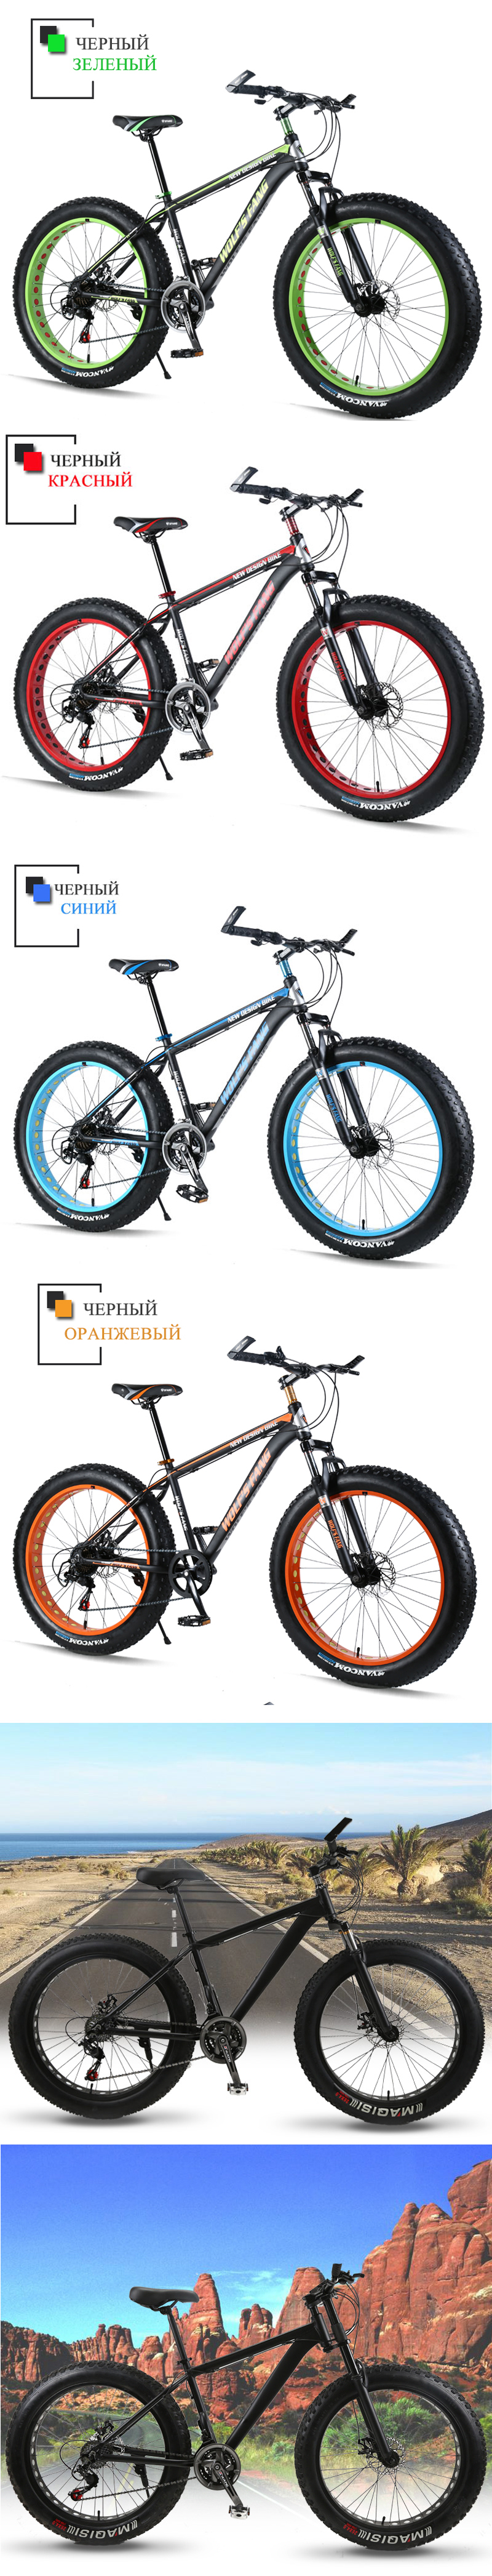 "H882637bbc6d8426ea412e90096ed7e4bo wolf's fang bicycle Mountain Bike road bike Aluminum alloy frame 26x4.0"" 7/21/24speed Frame Snow Beach Oversized Bicycle Bikes"